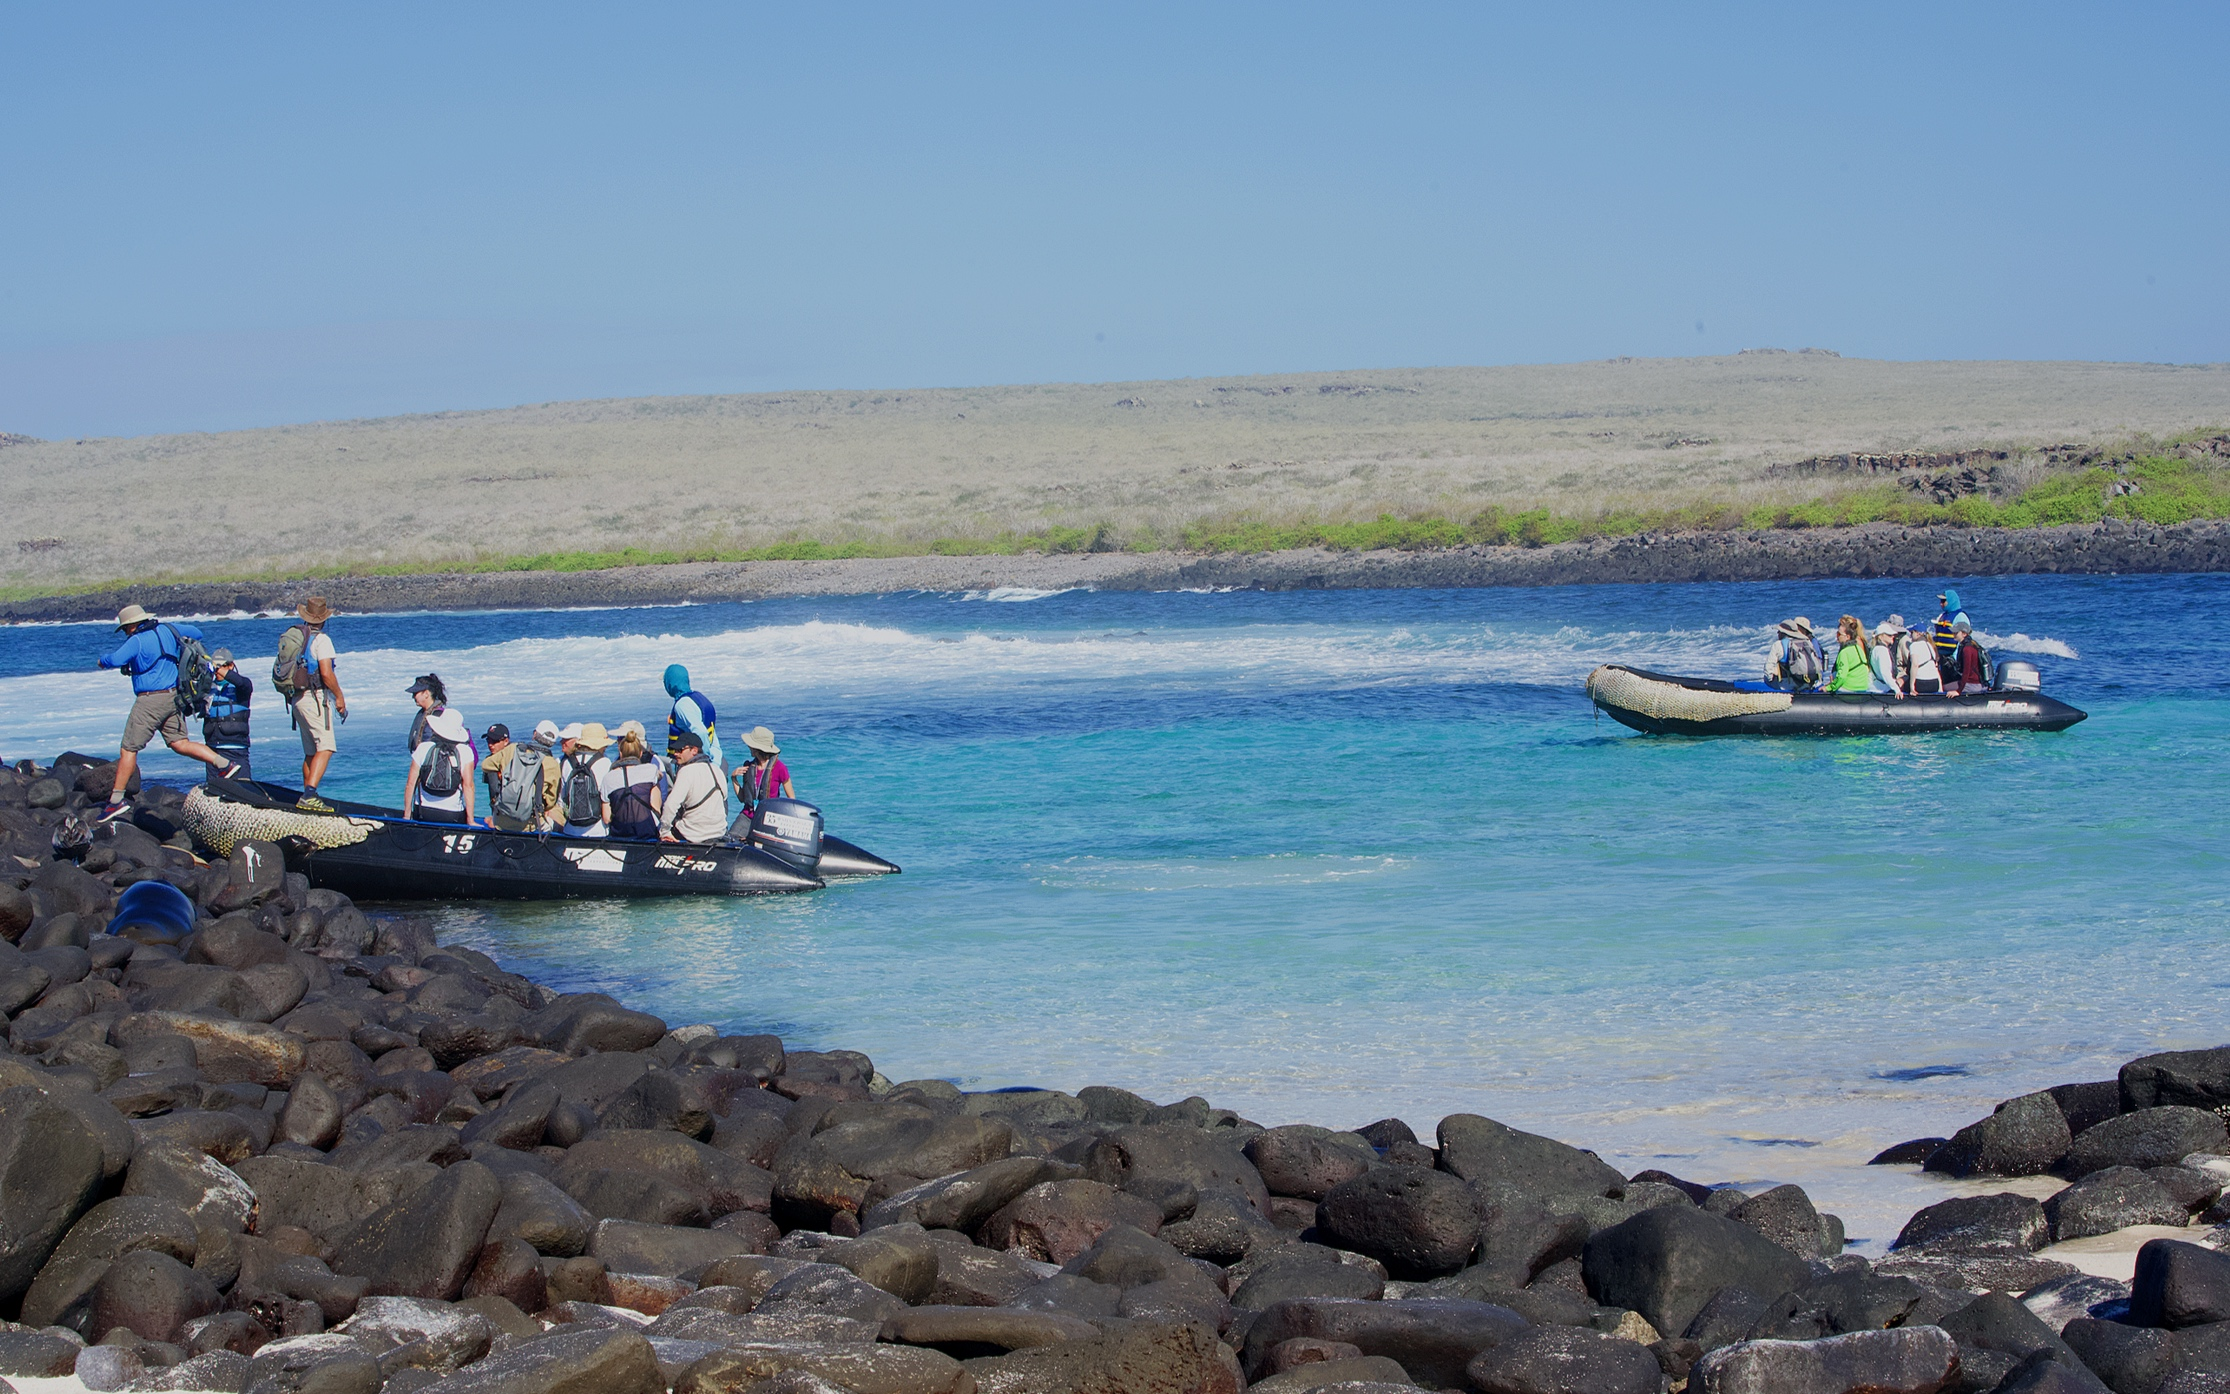 Our zodiacs arriving at Punta Suarez.